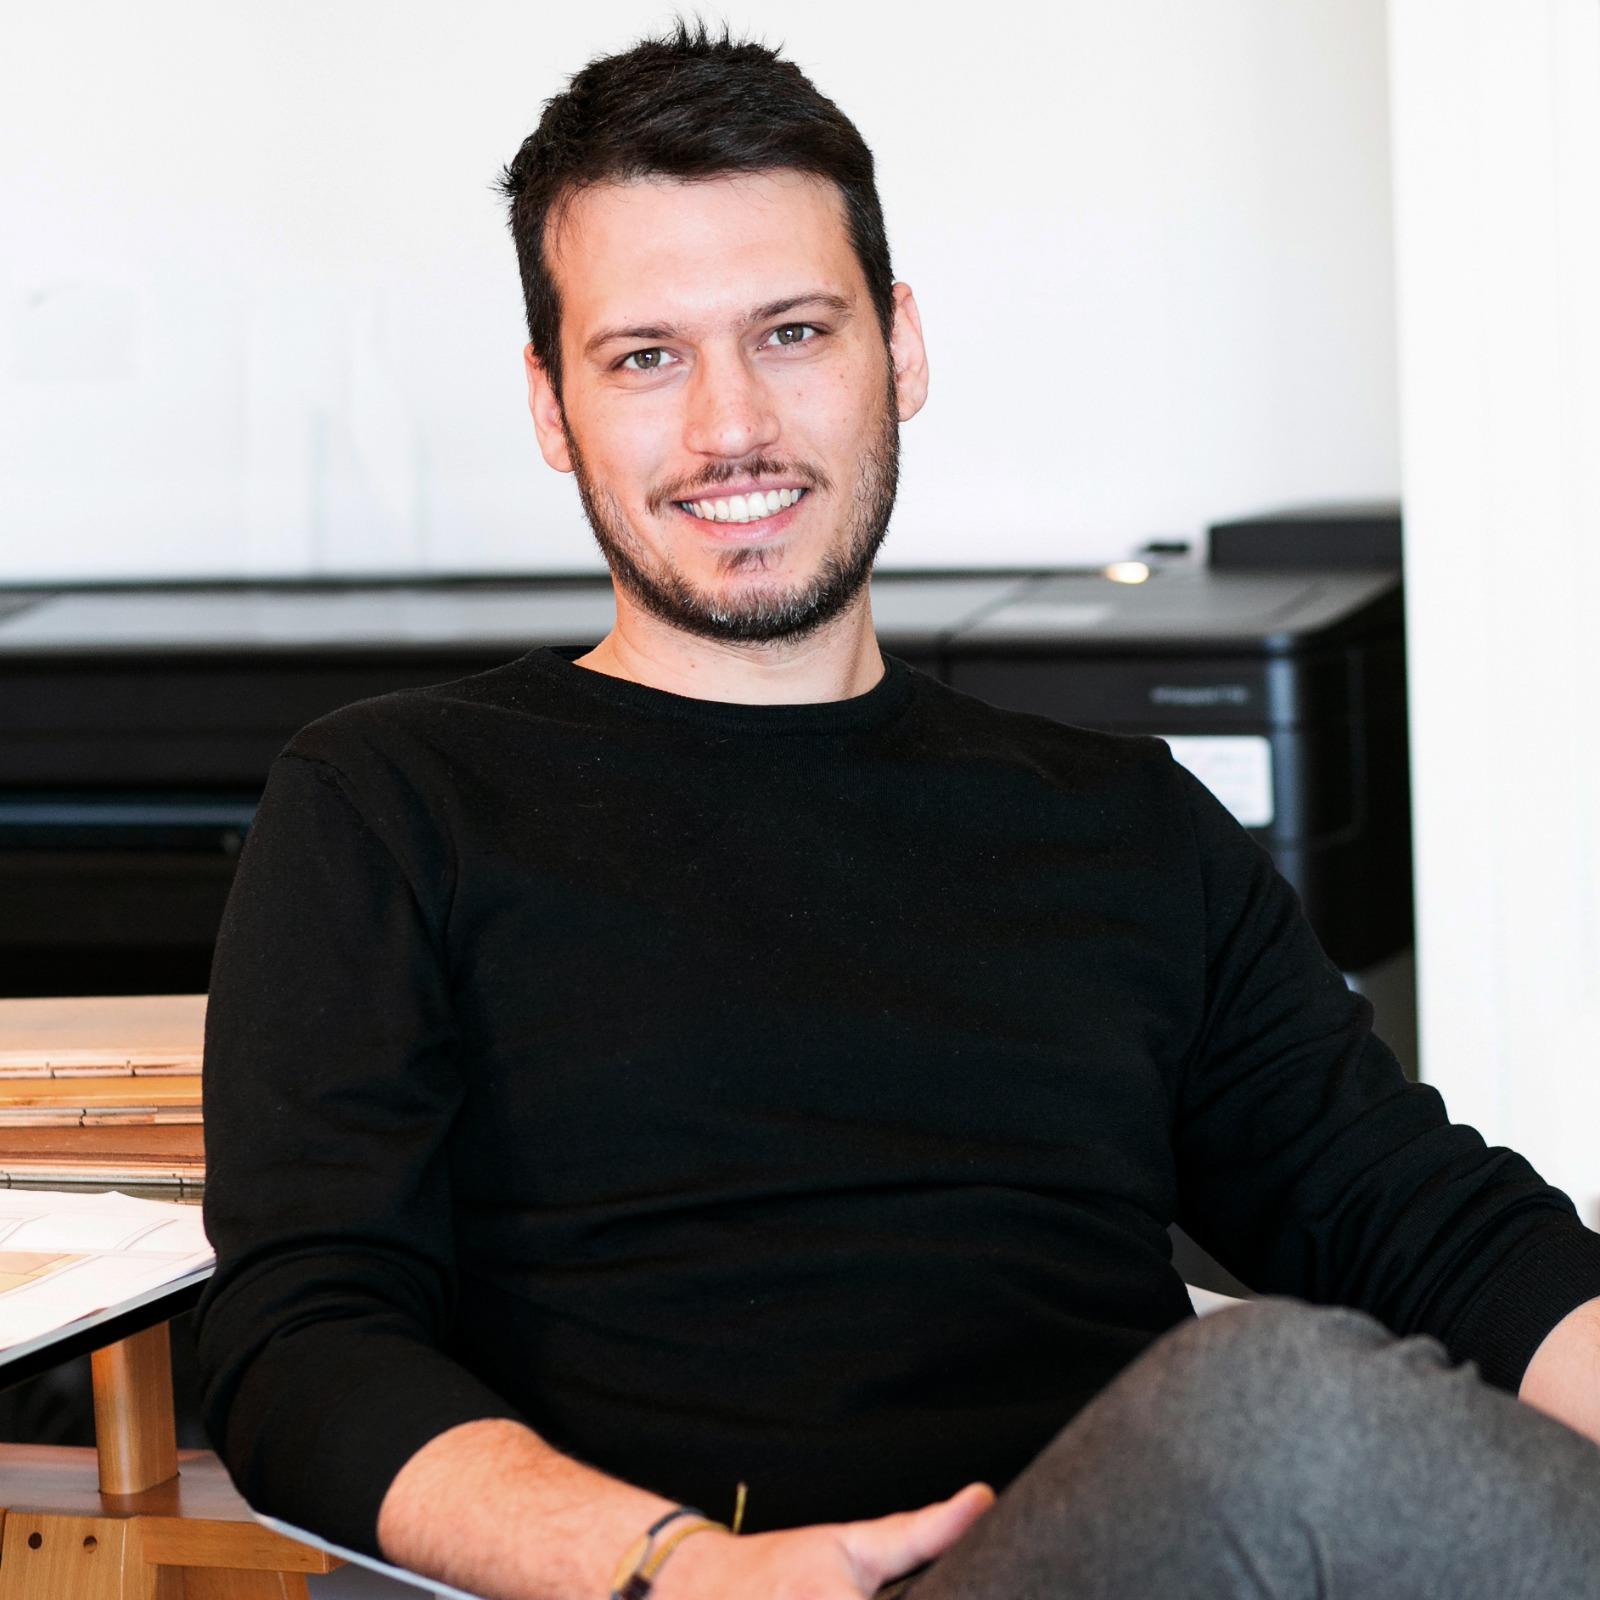 https://www.pucciarelliarchitetti.it/wp-content/uploads/2021/04/mario.jpeg